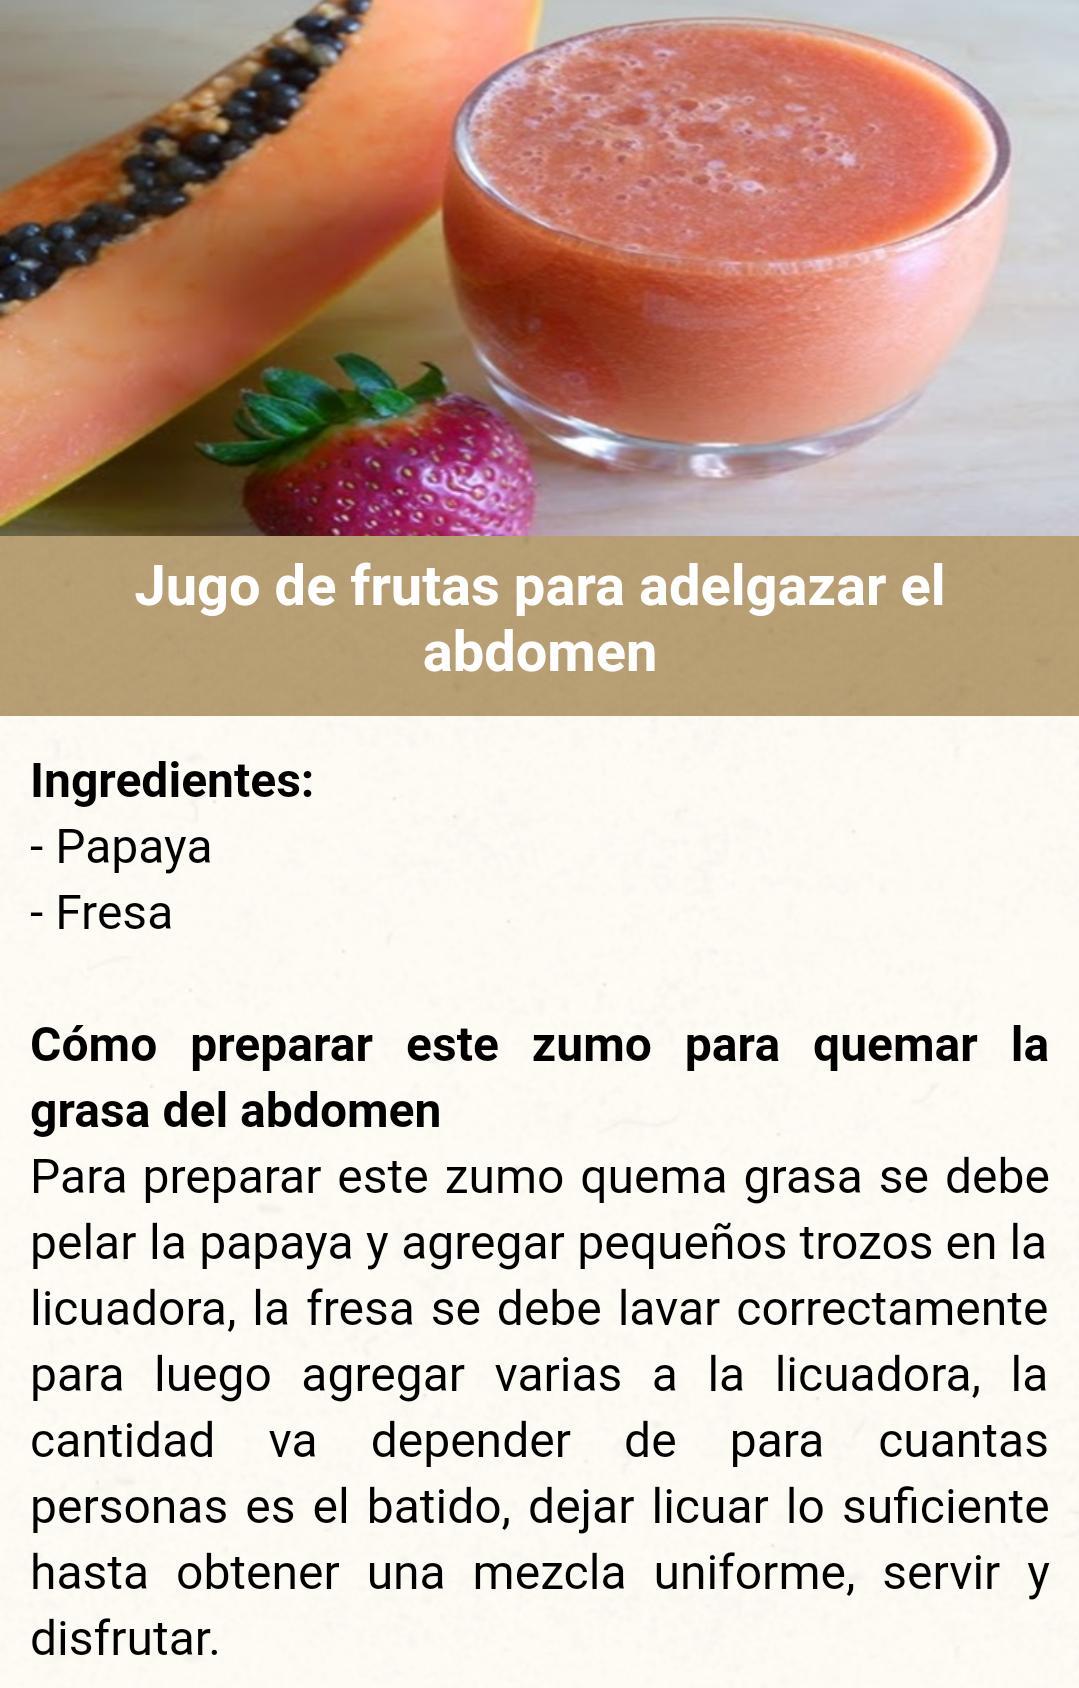 jugo de frutas quema grasa